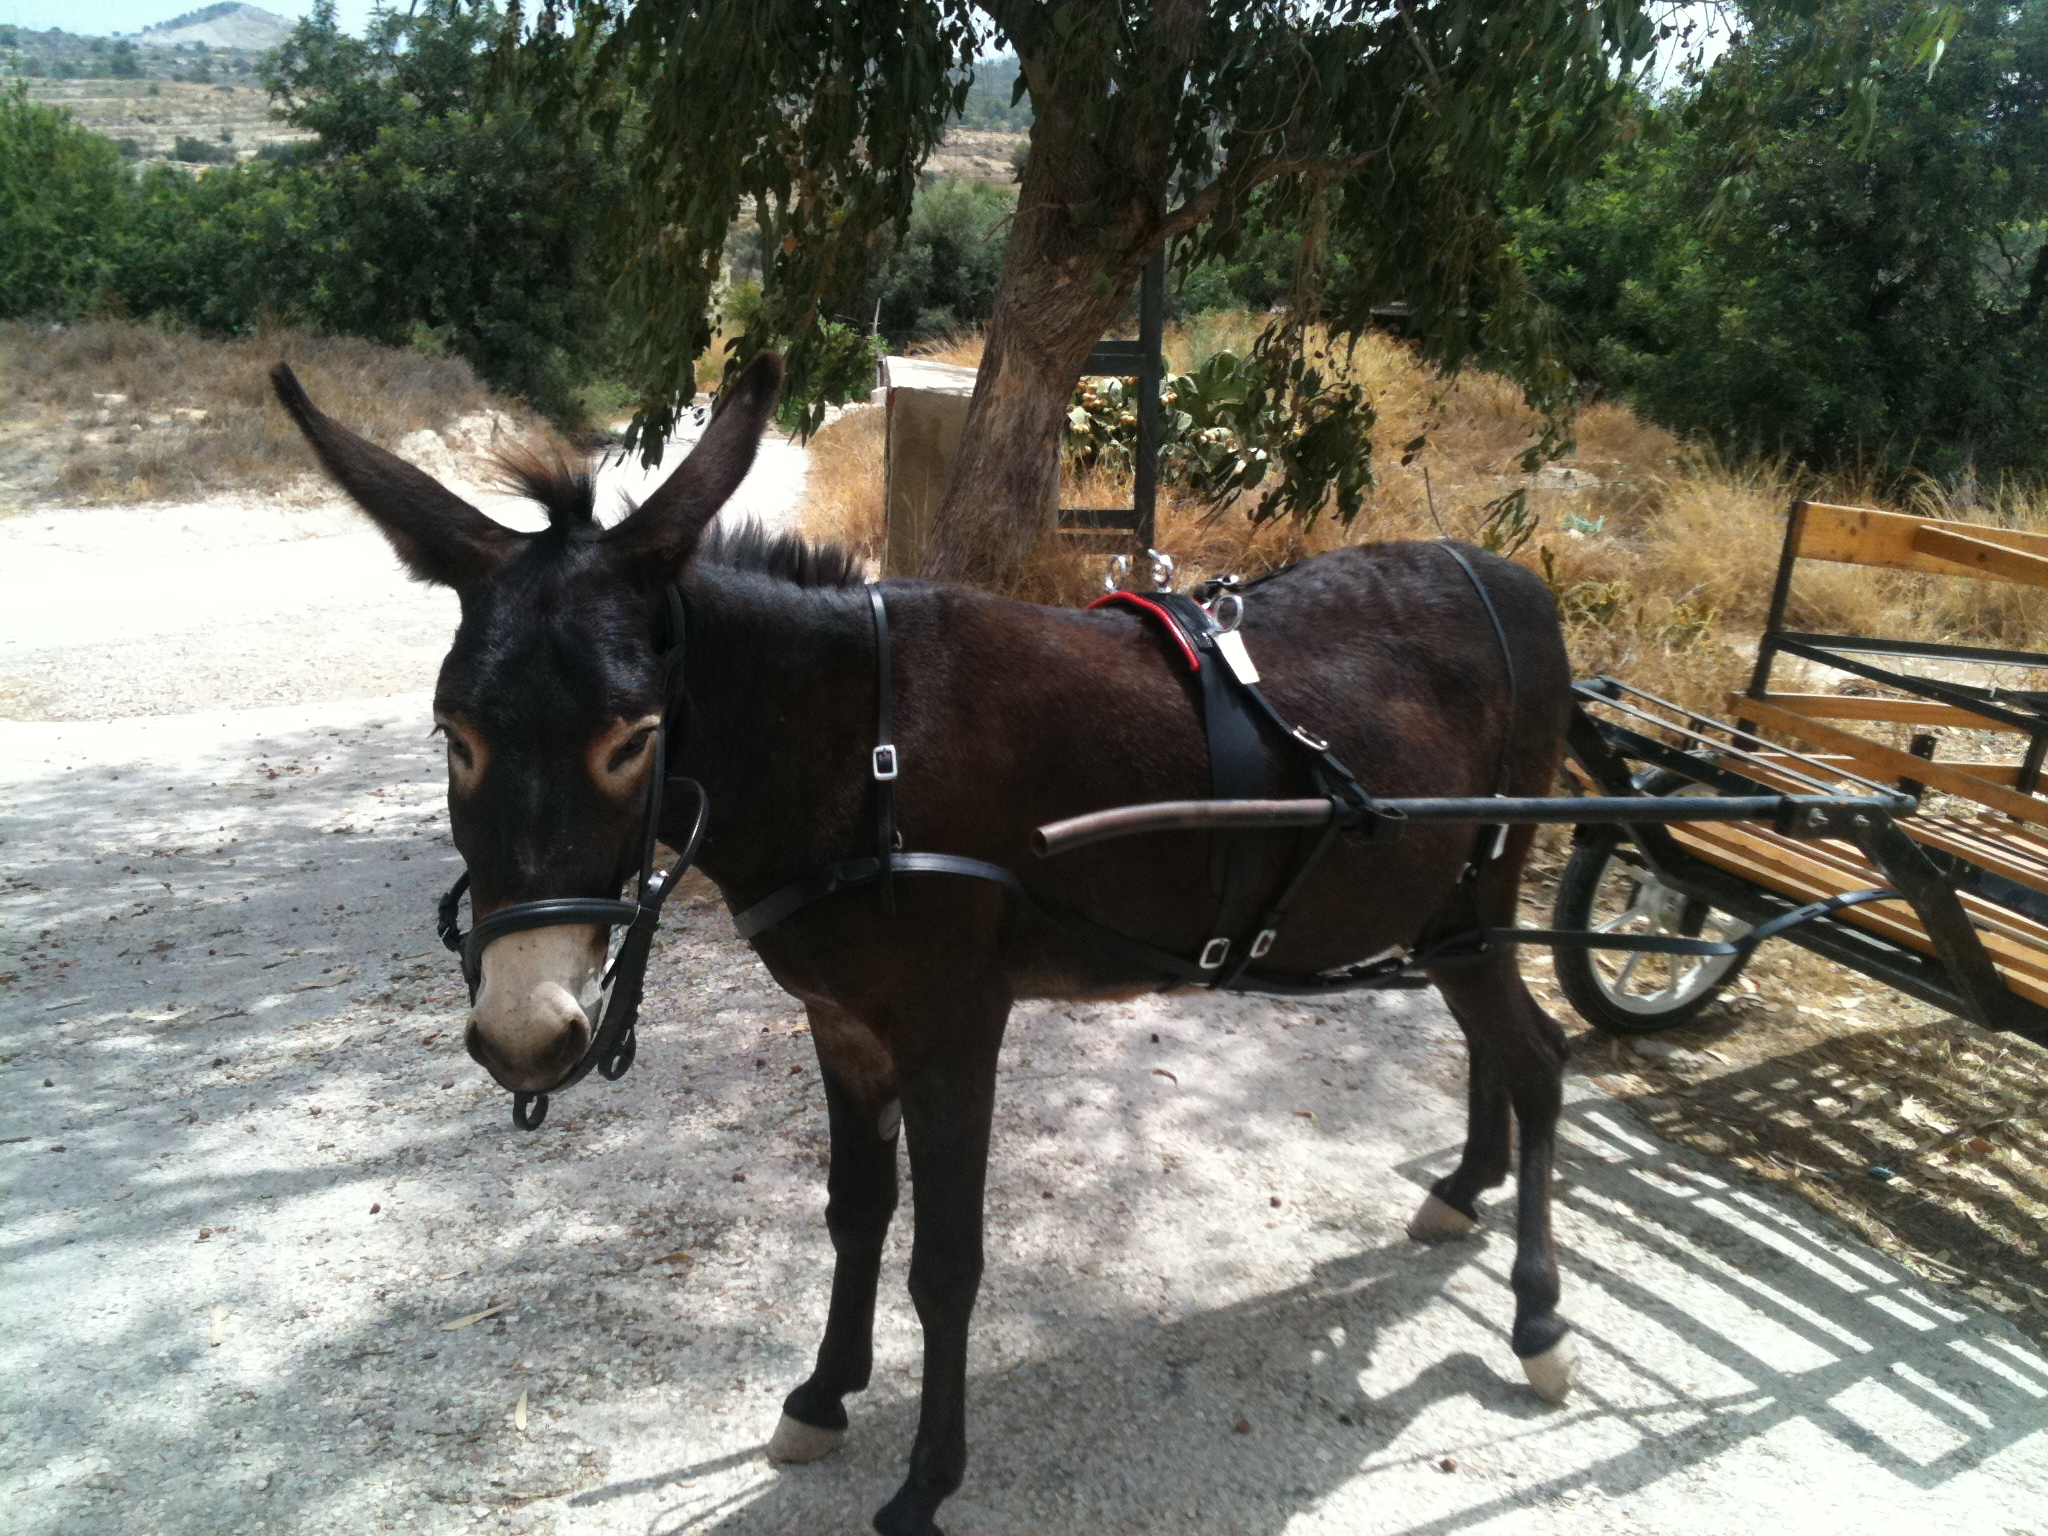 Donkey cart blues